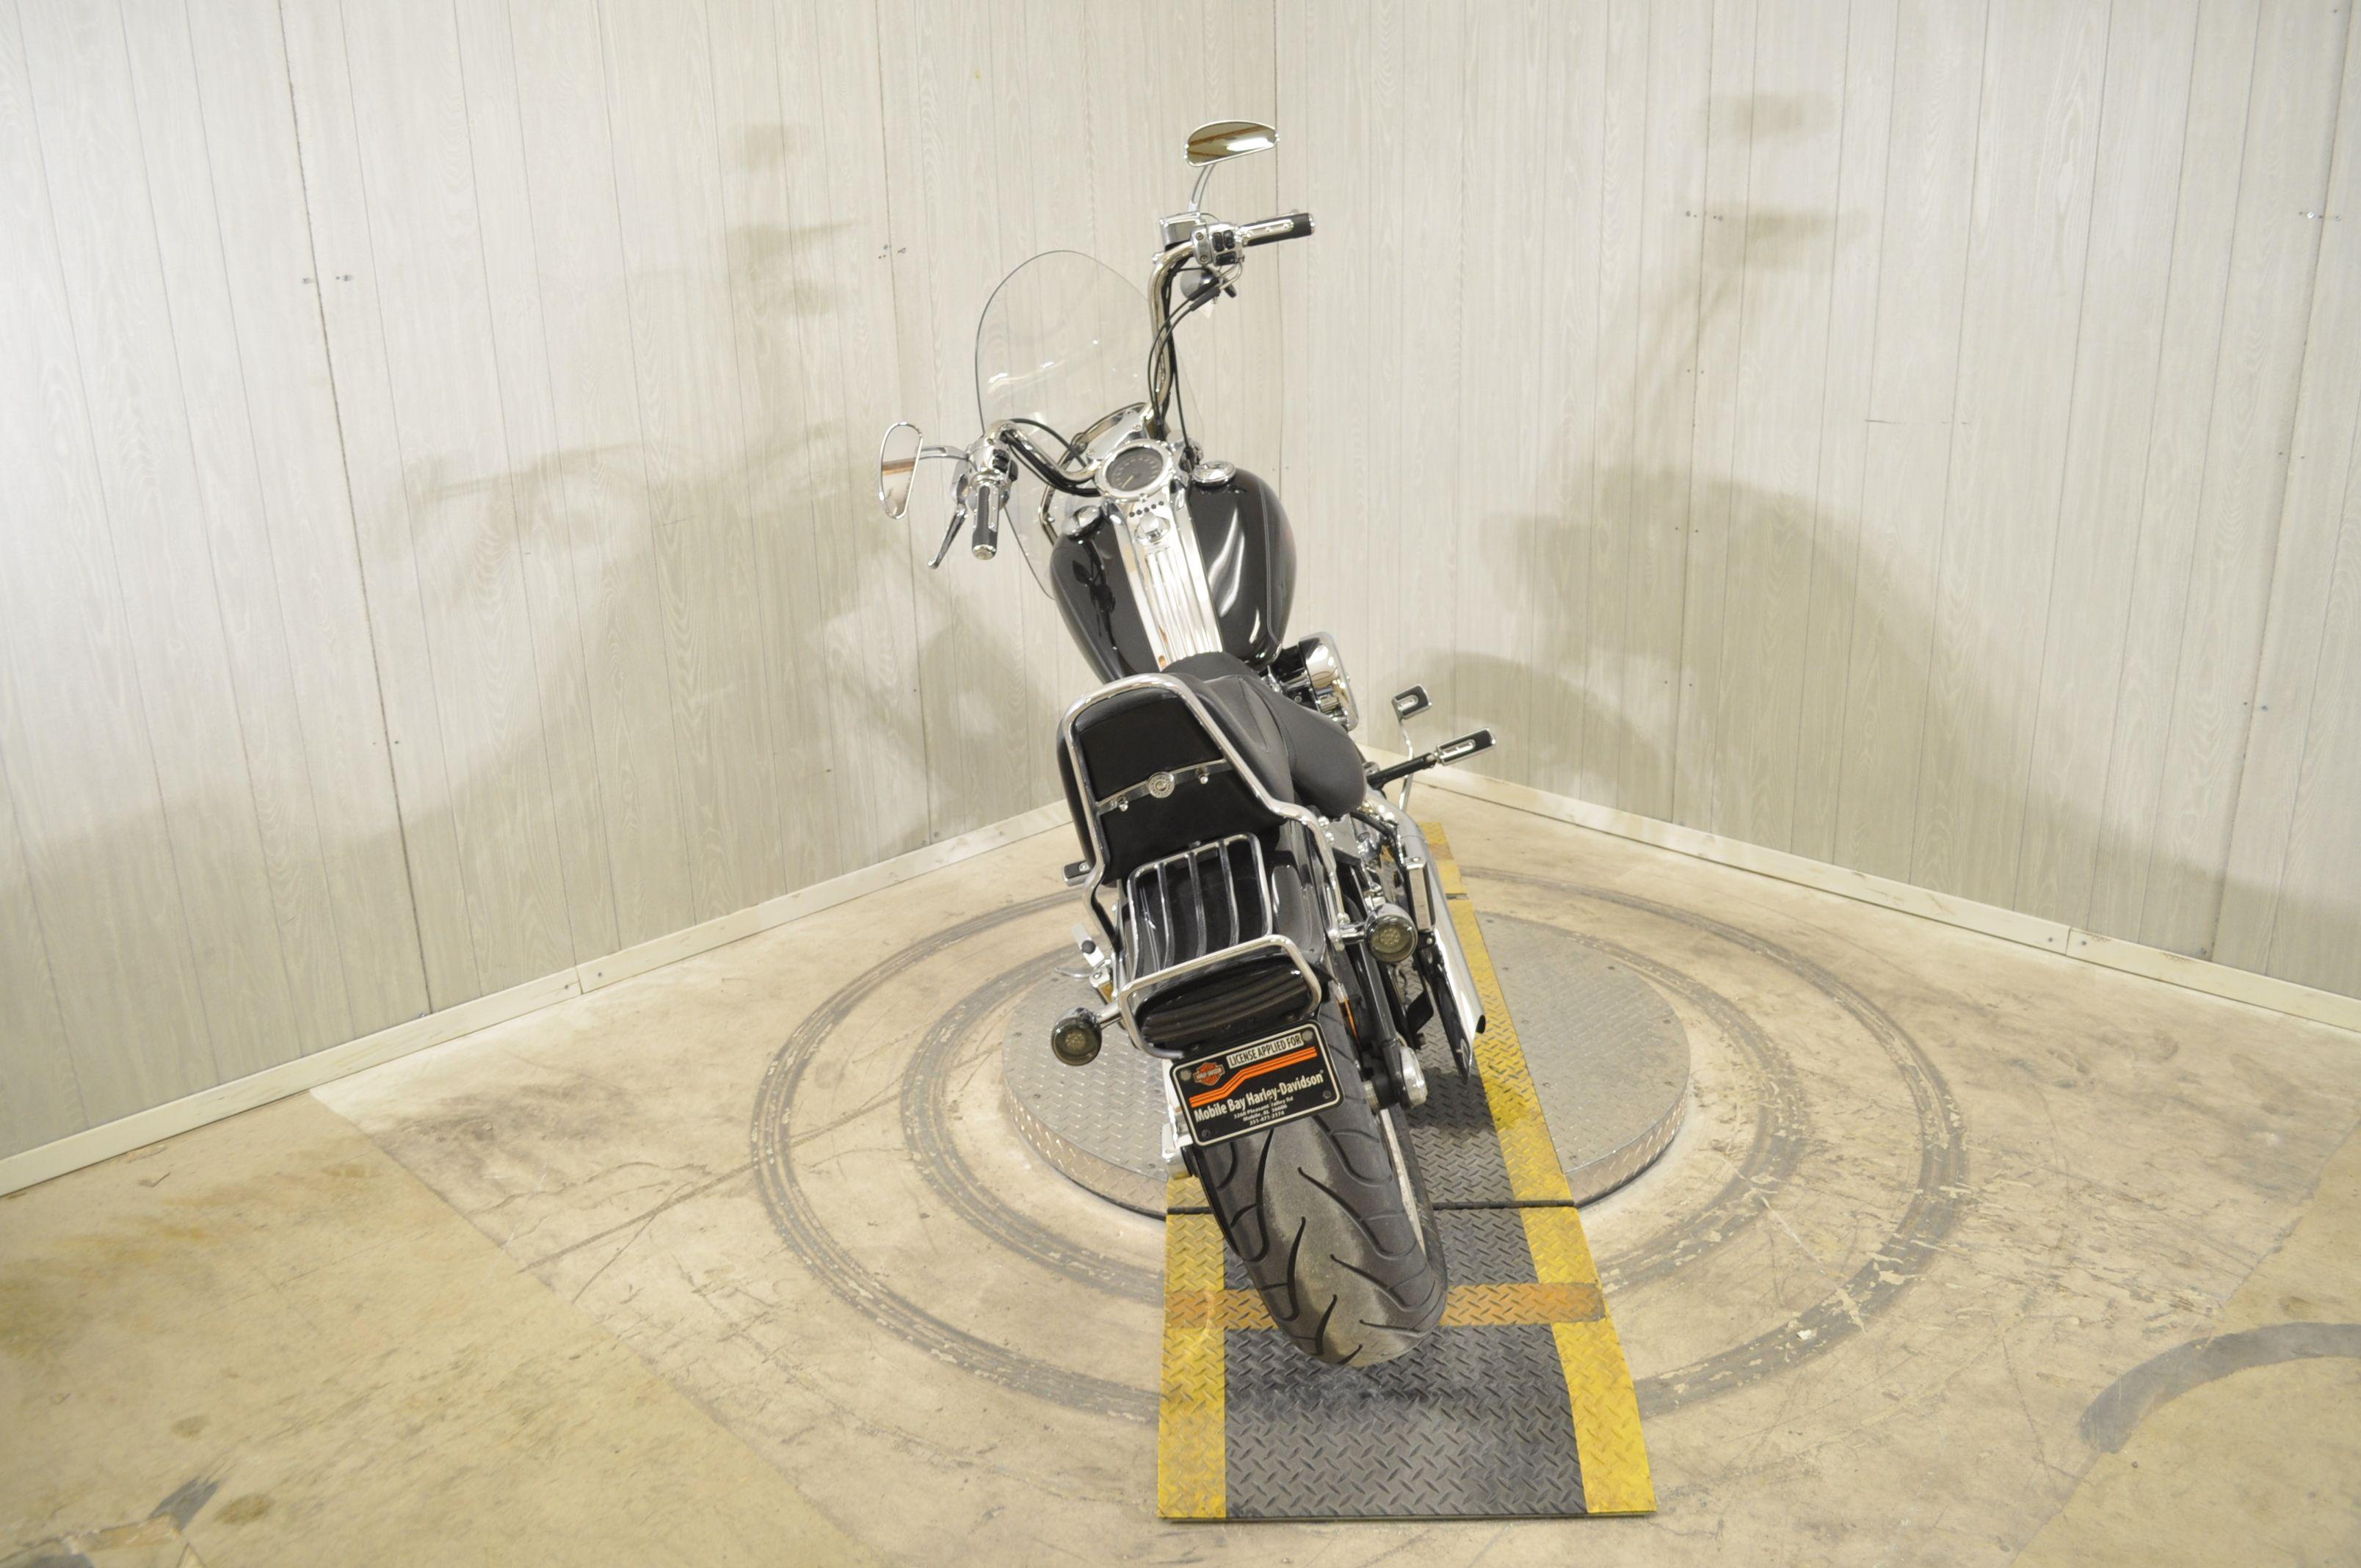 Pre-Owned 2008 Harley-Davidson Custom FXSTC